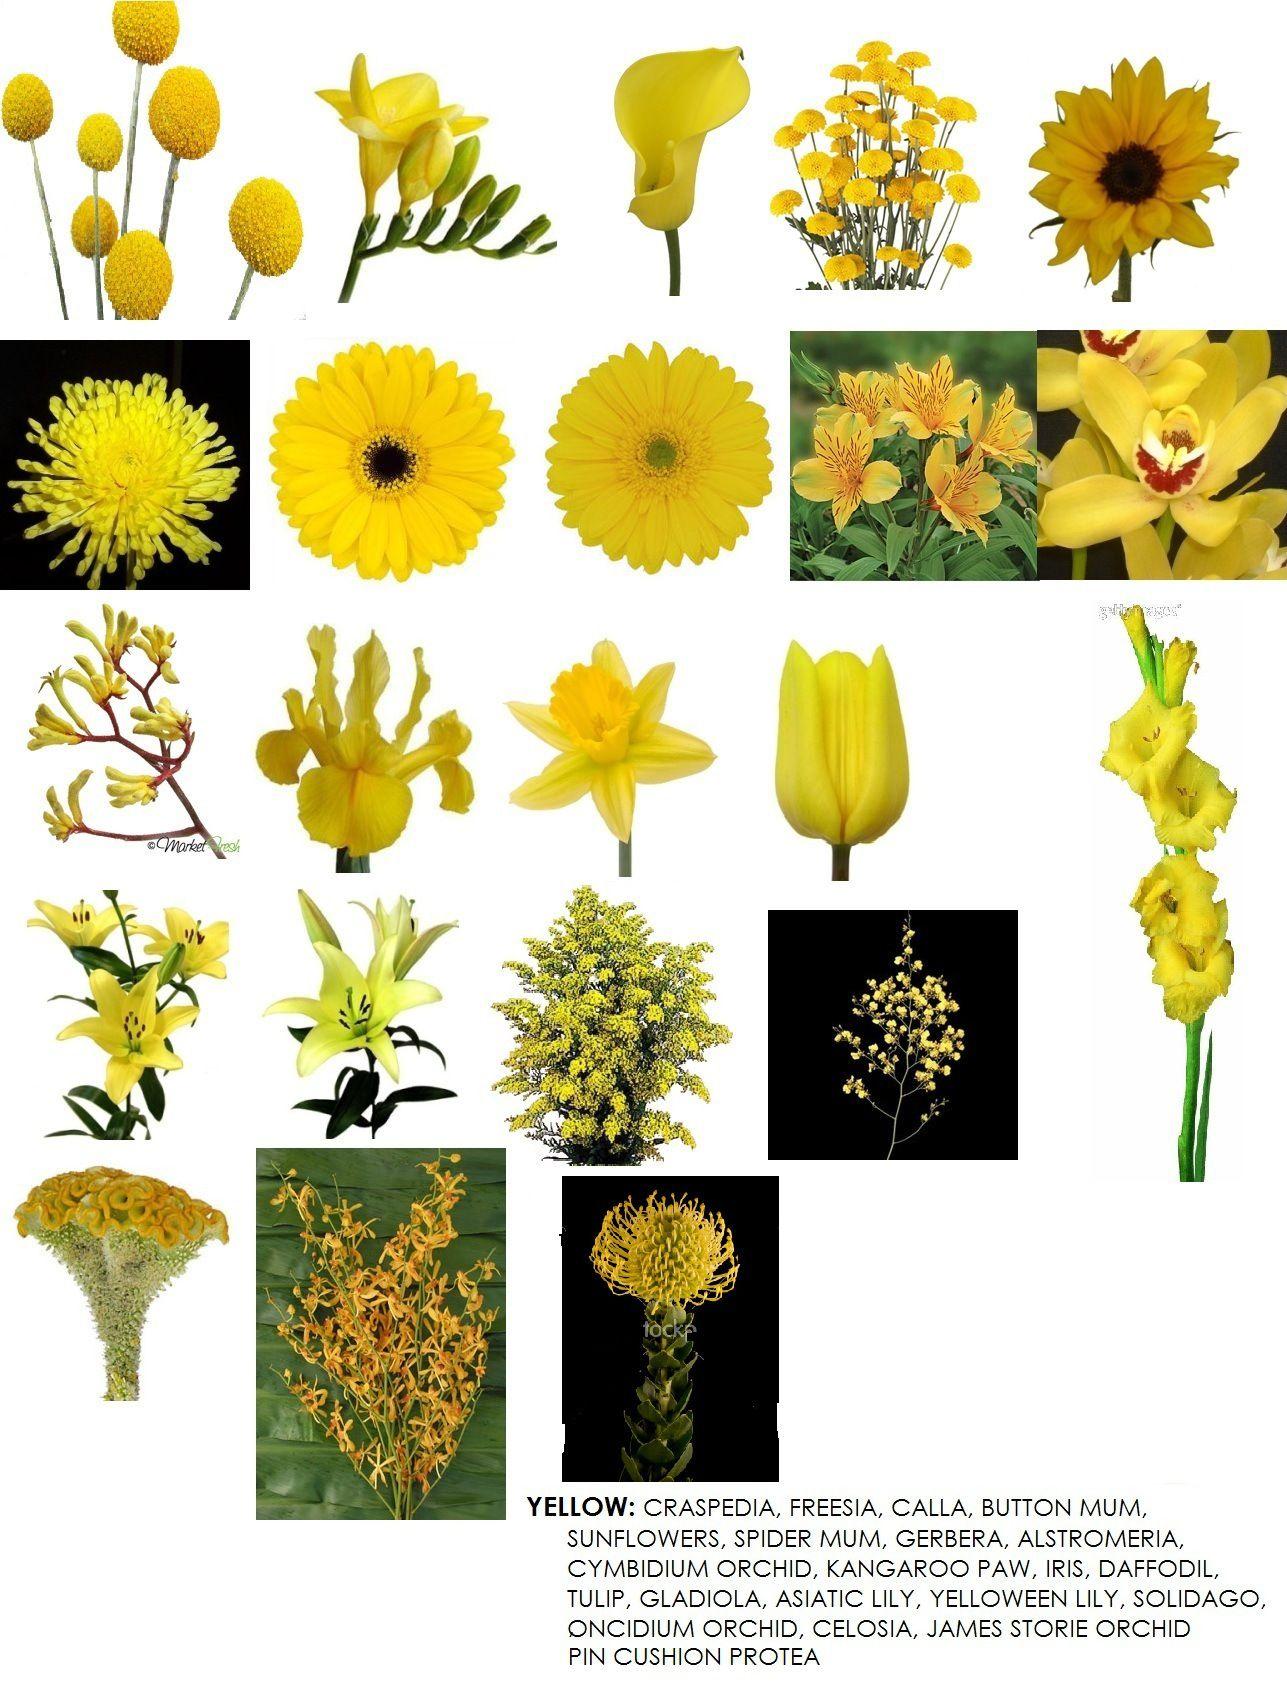 Tipos de flores amarillas wedding flowers pinterest - Clases de flores amarillas ...